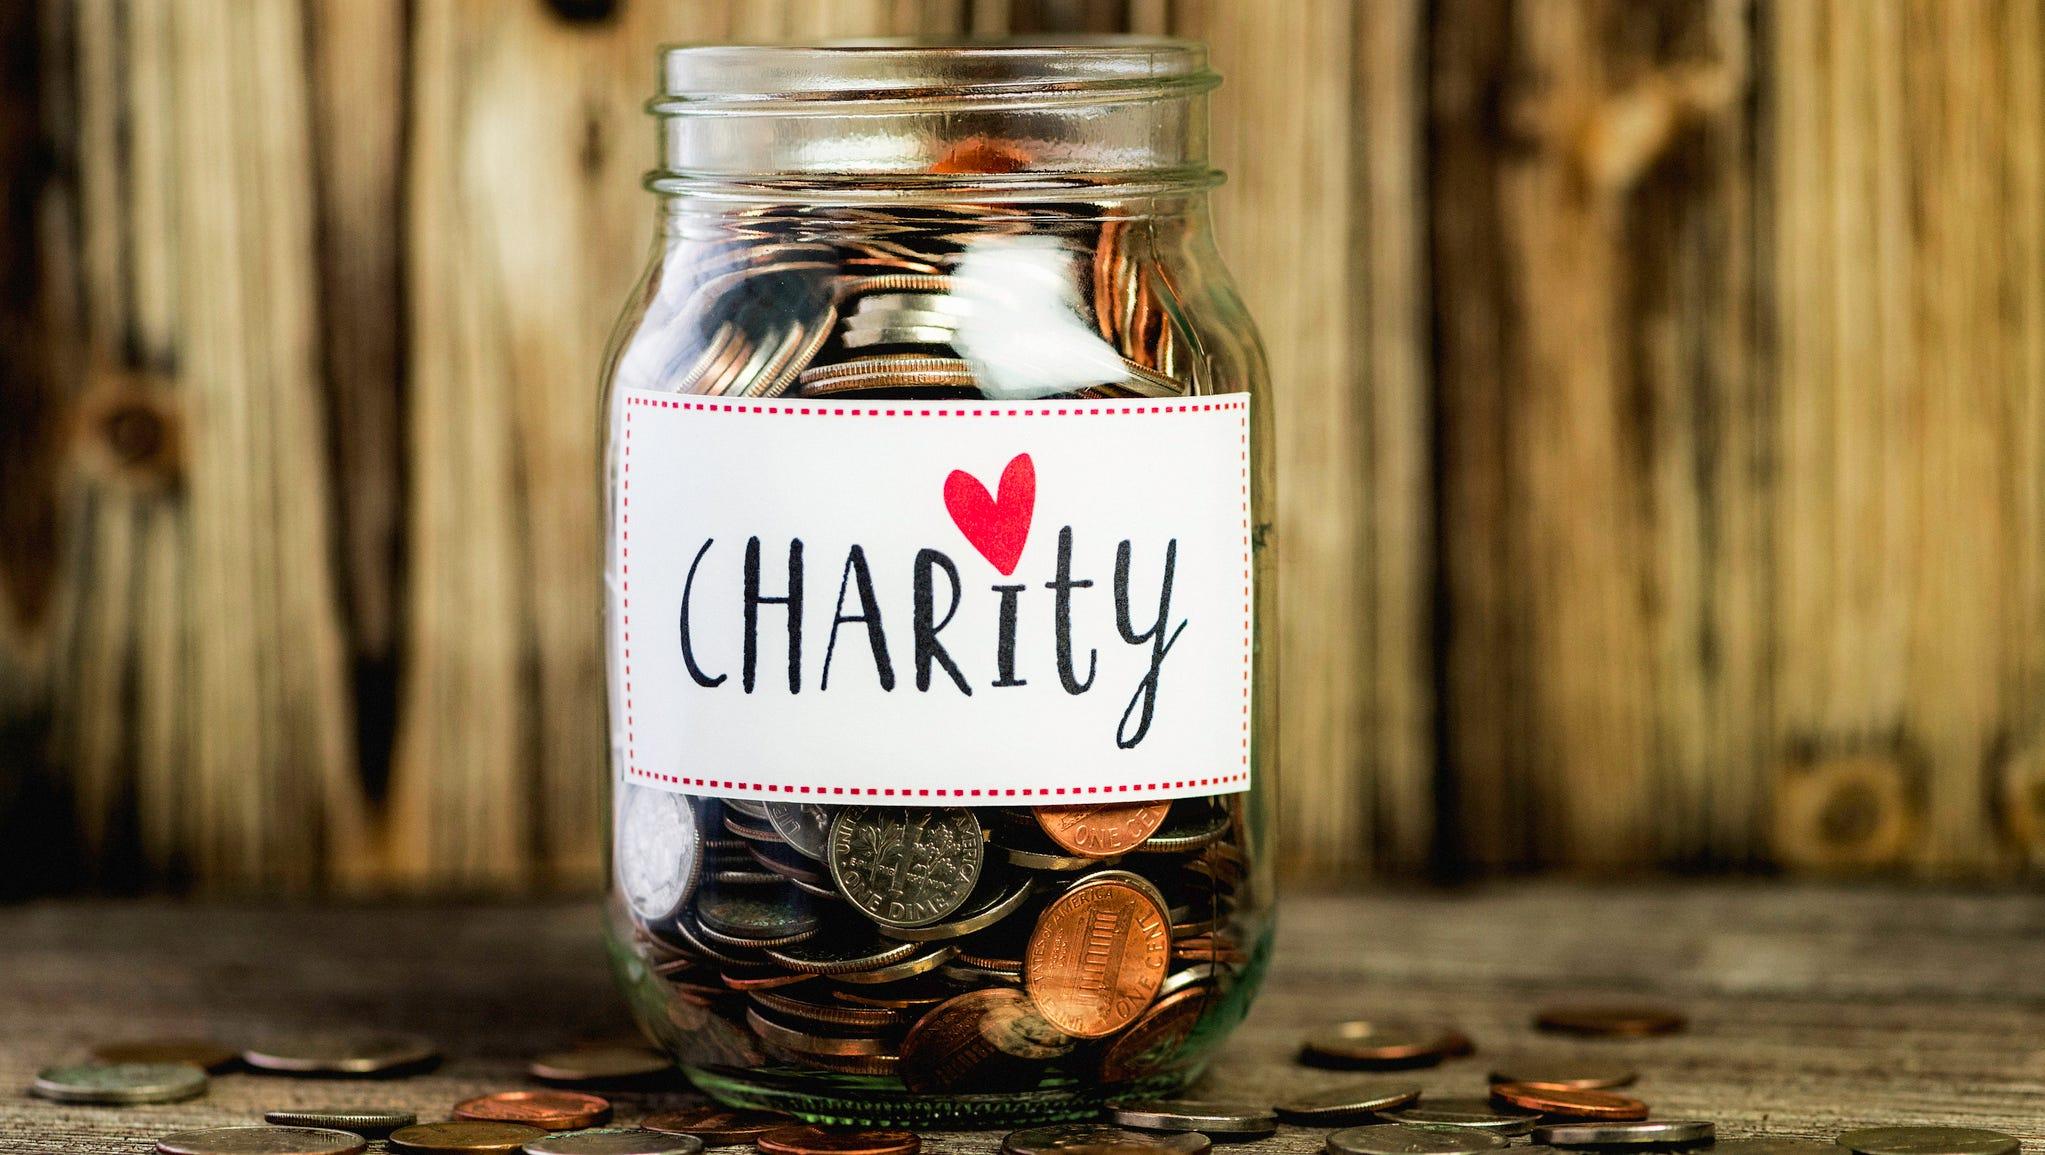 Charity Shops – Lending Hand to a Needy